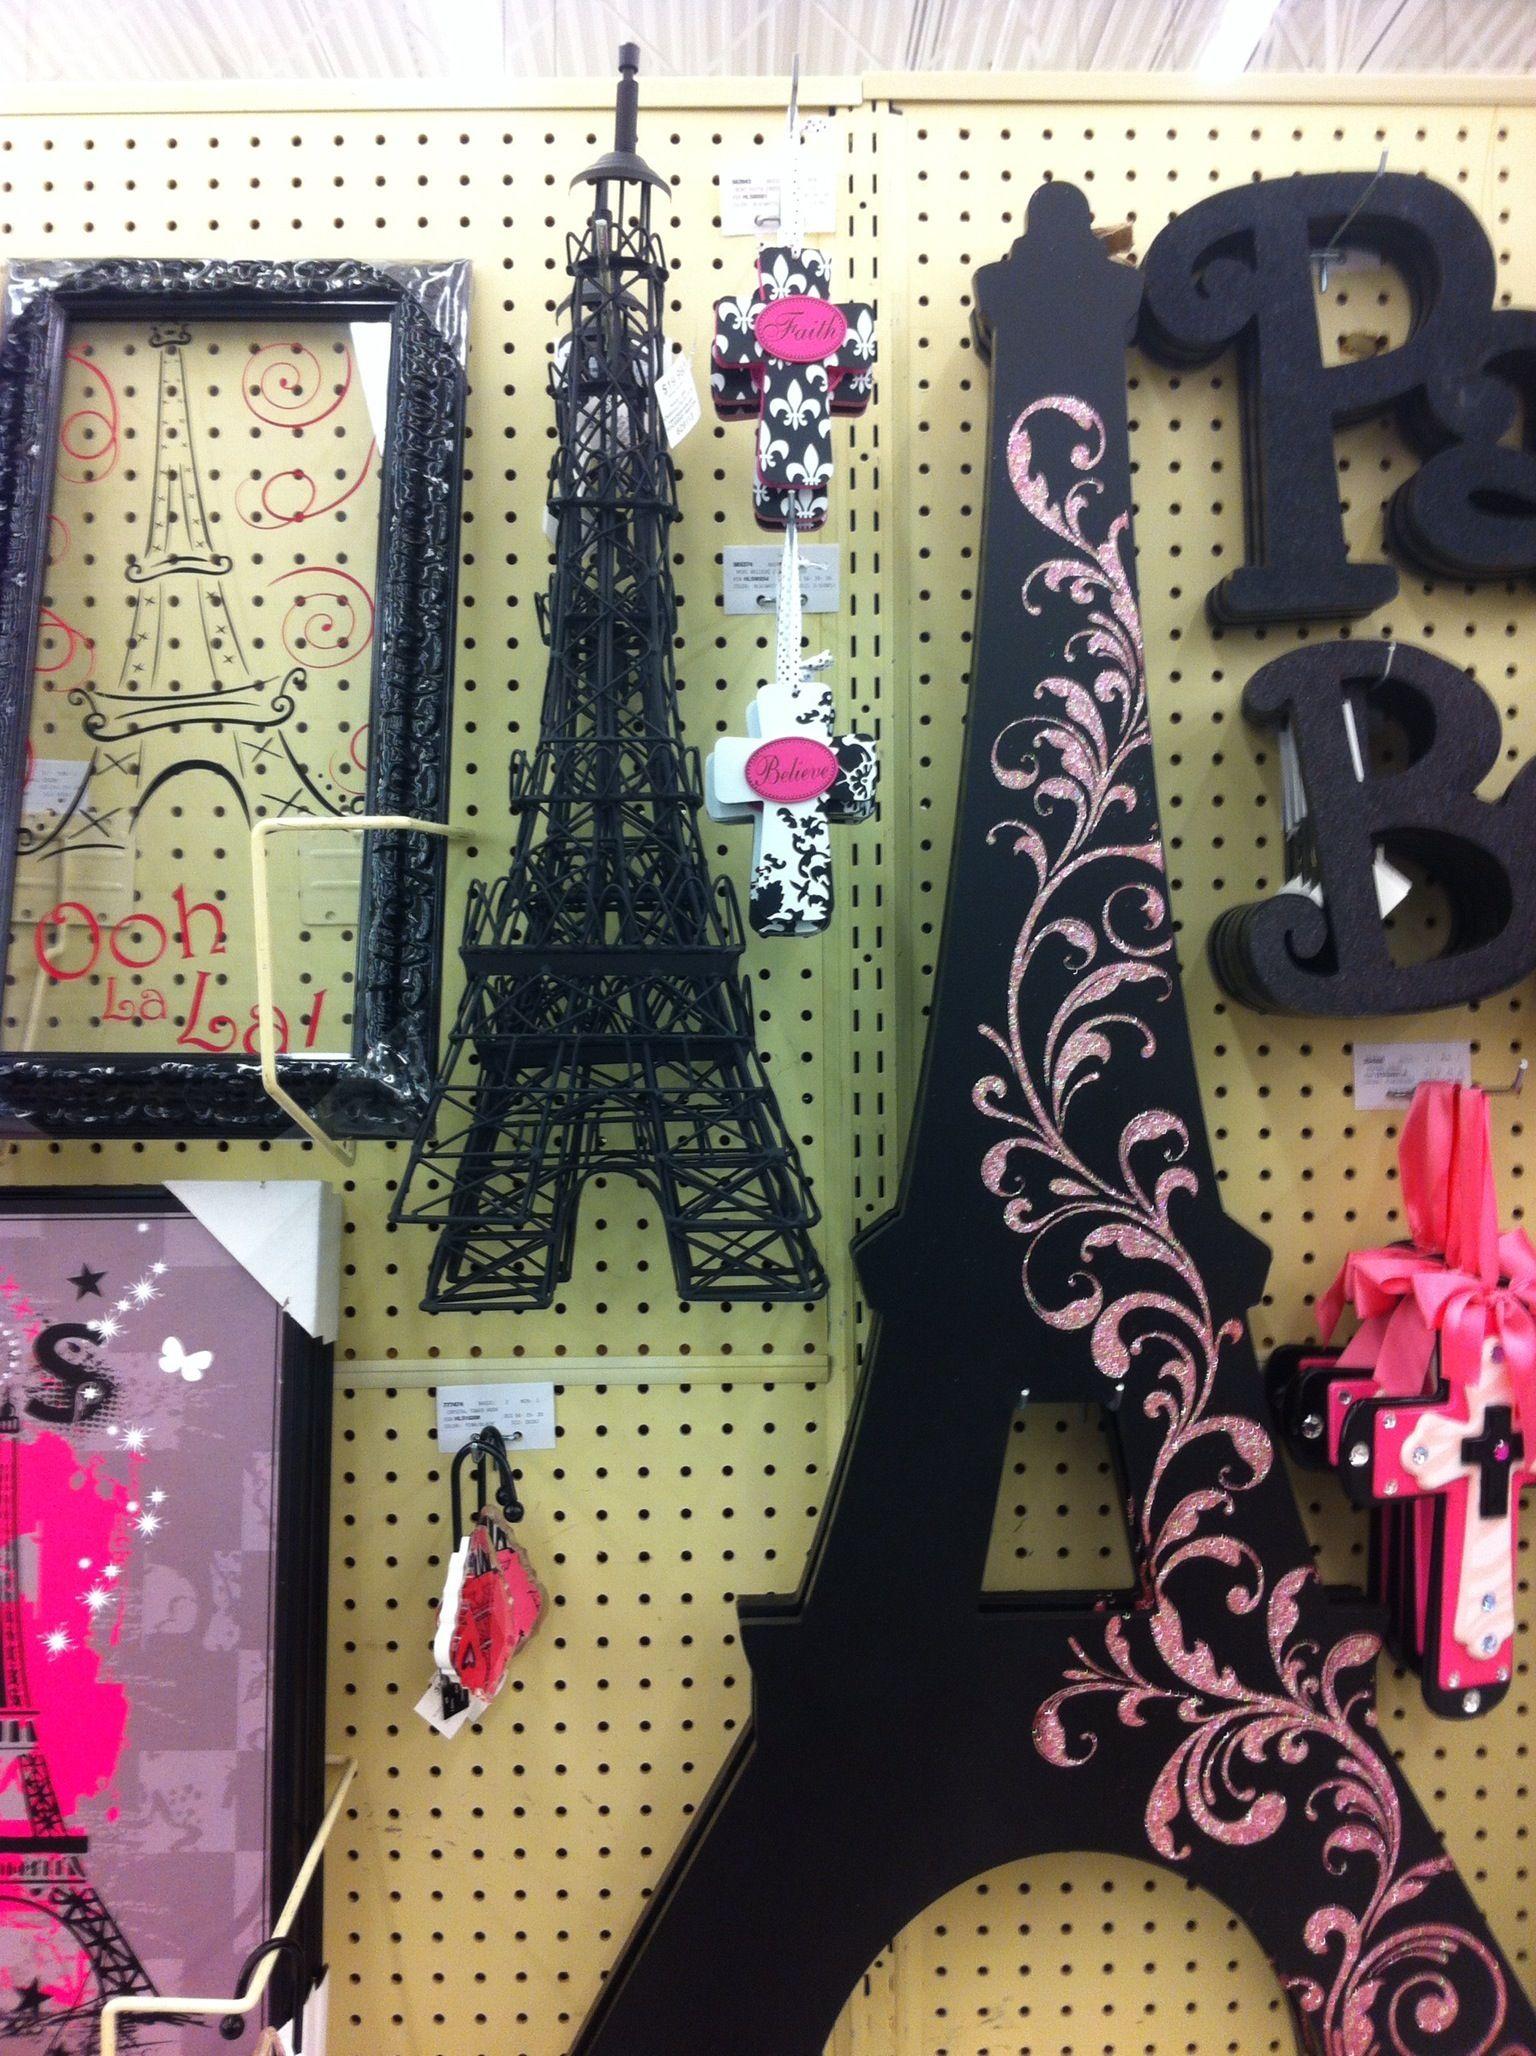 Eiffel Tower Wall Decoration Found One Just Like It At Hobby Lobby Description From Pinterest Com Paris Room Decor Paris Decor Bedroom Paris Themed Bedroom